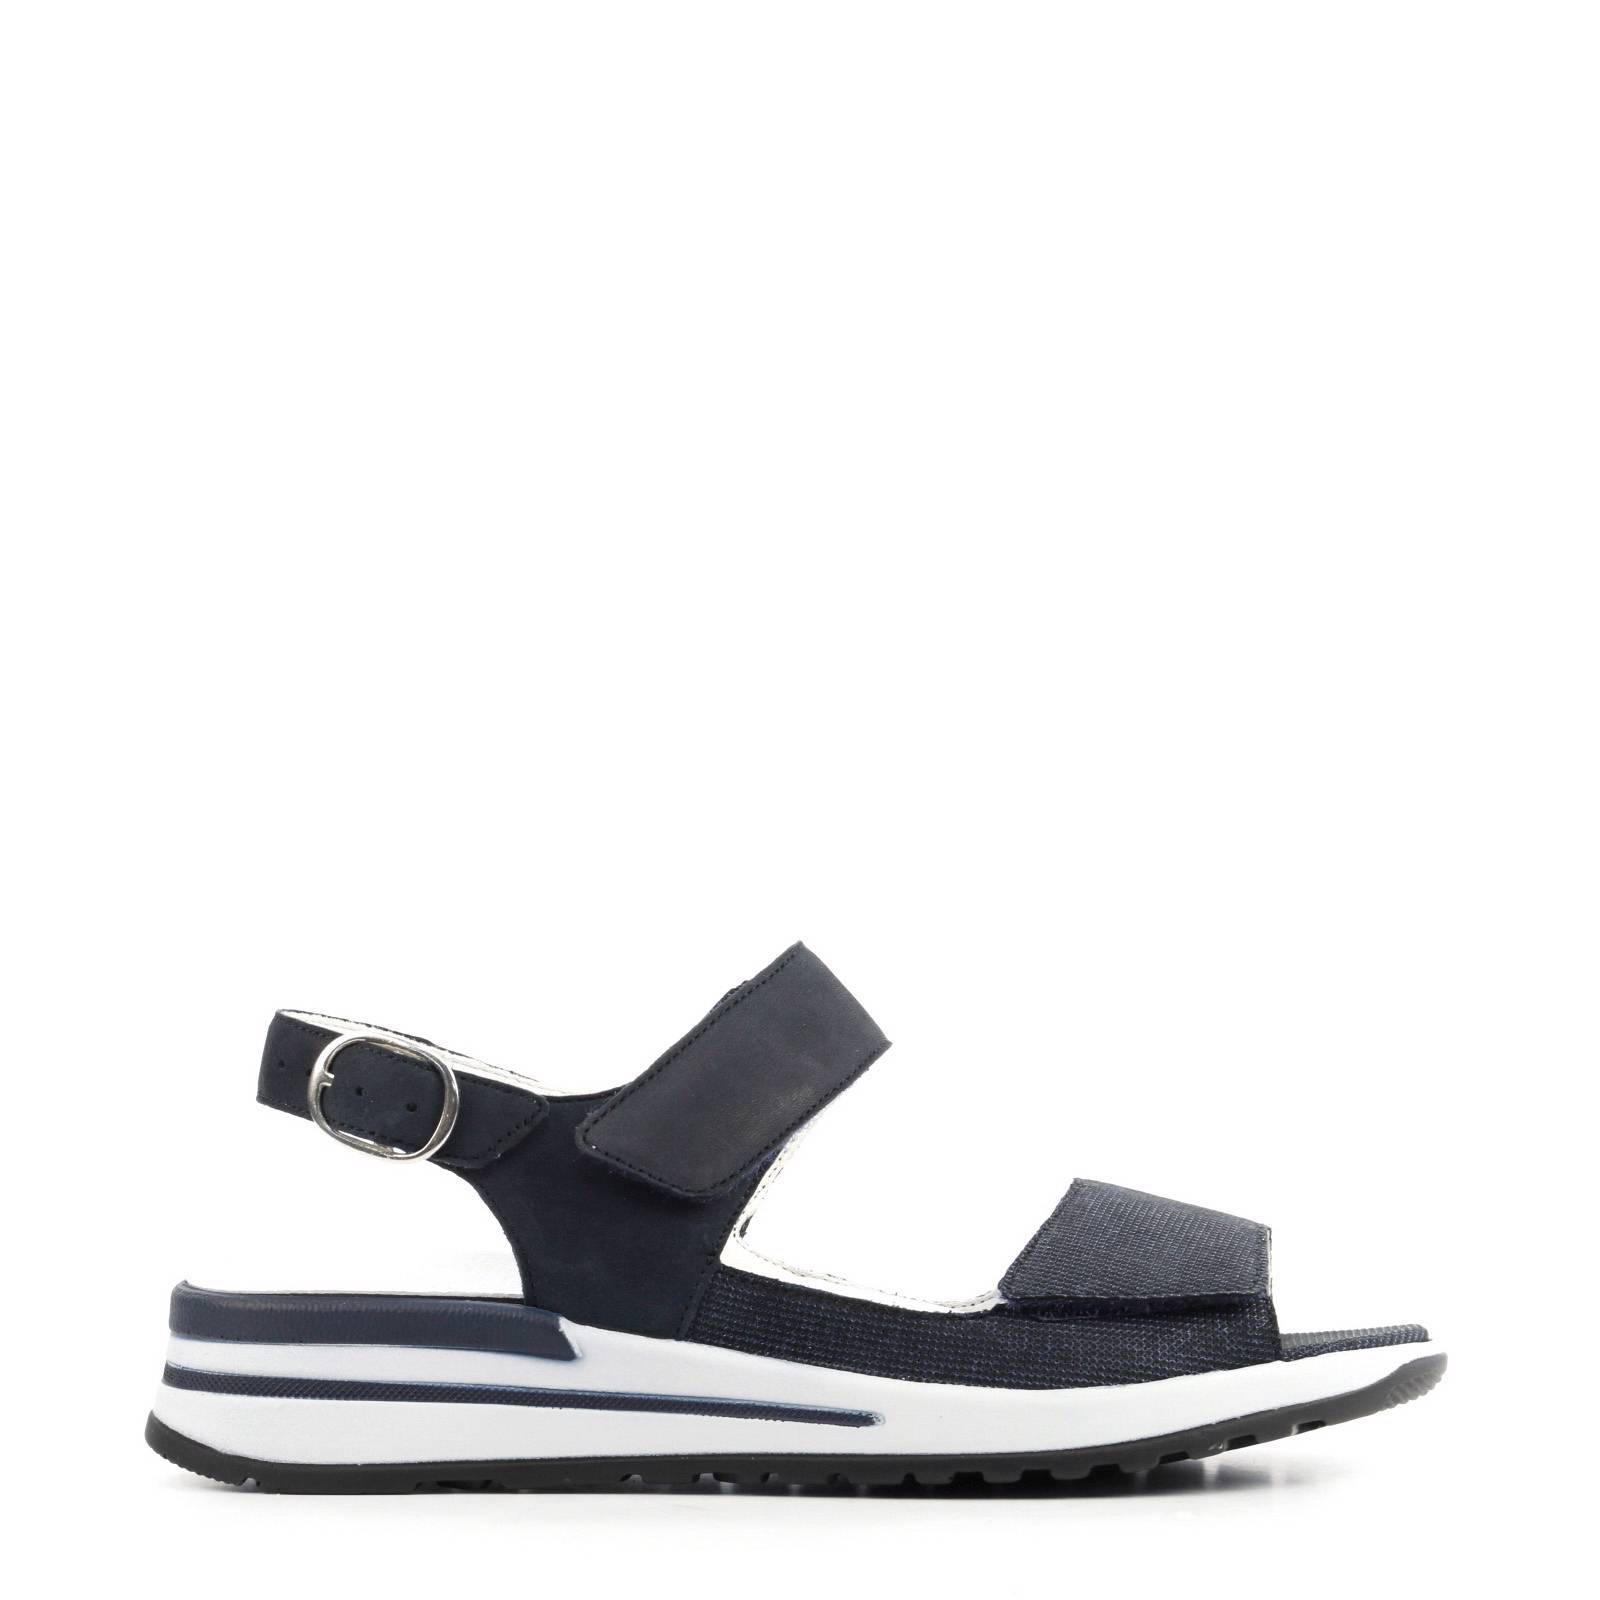 WALDLÄUFER Komfort Sandalen blau